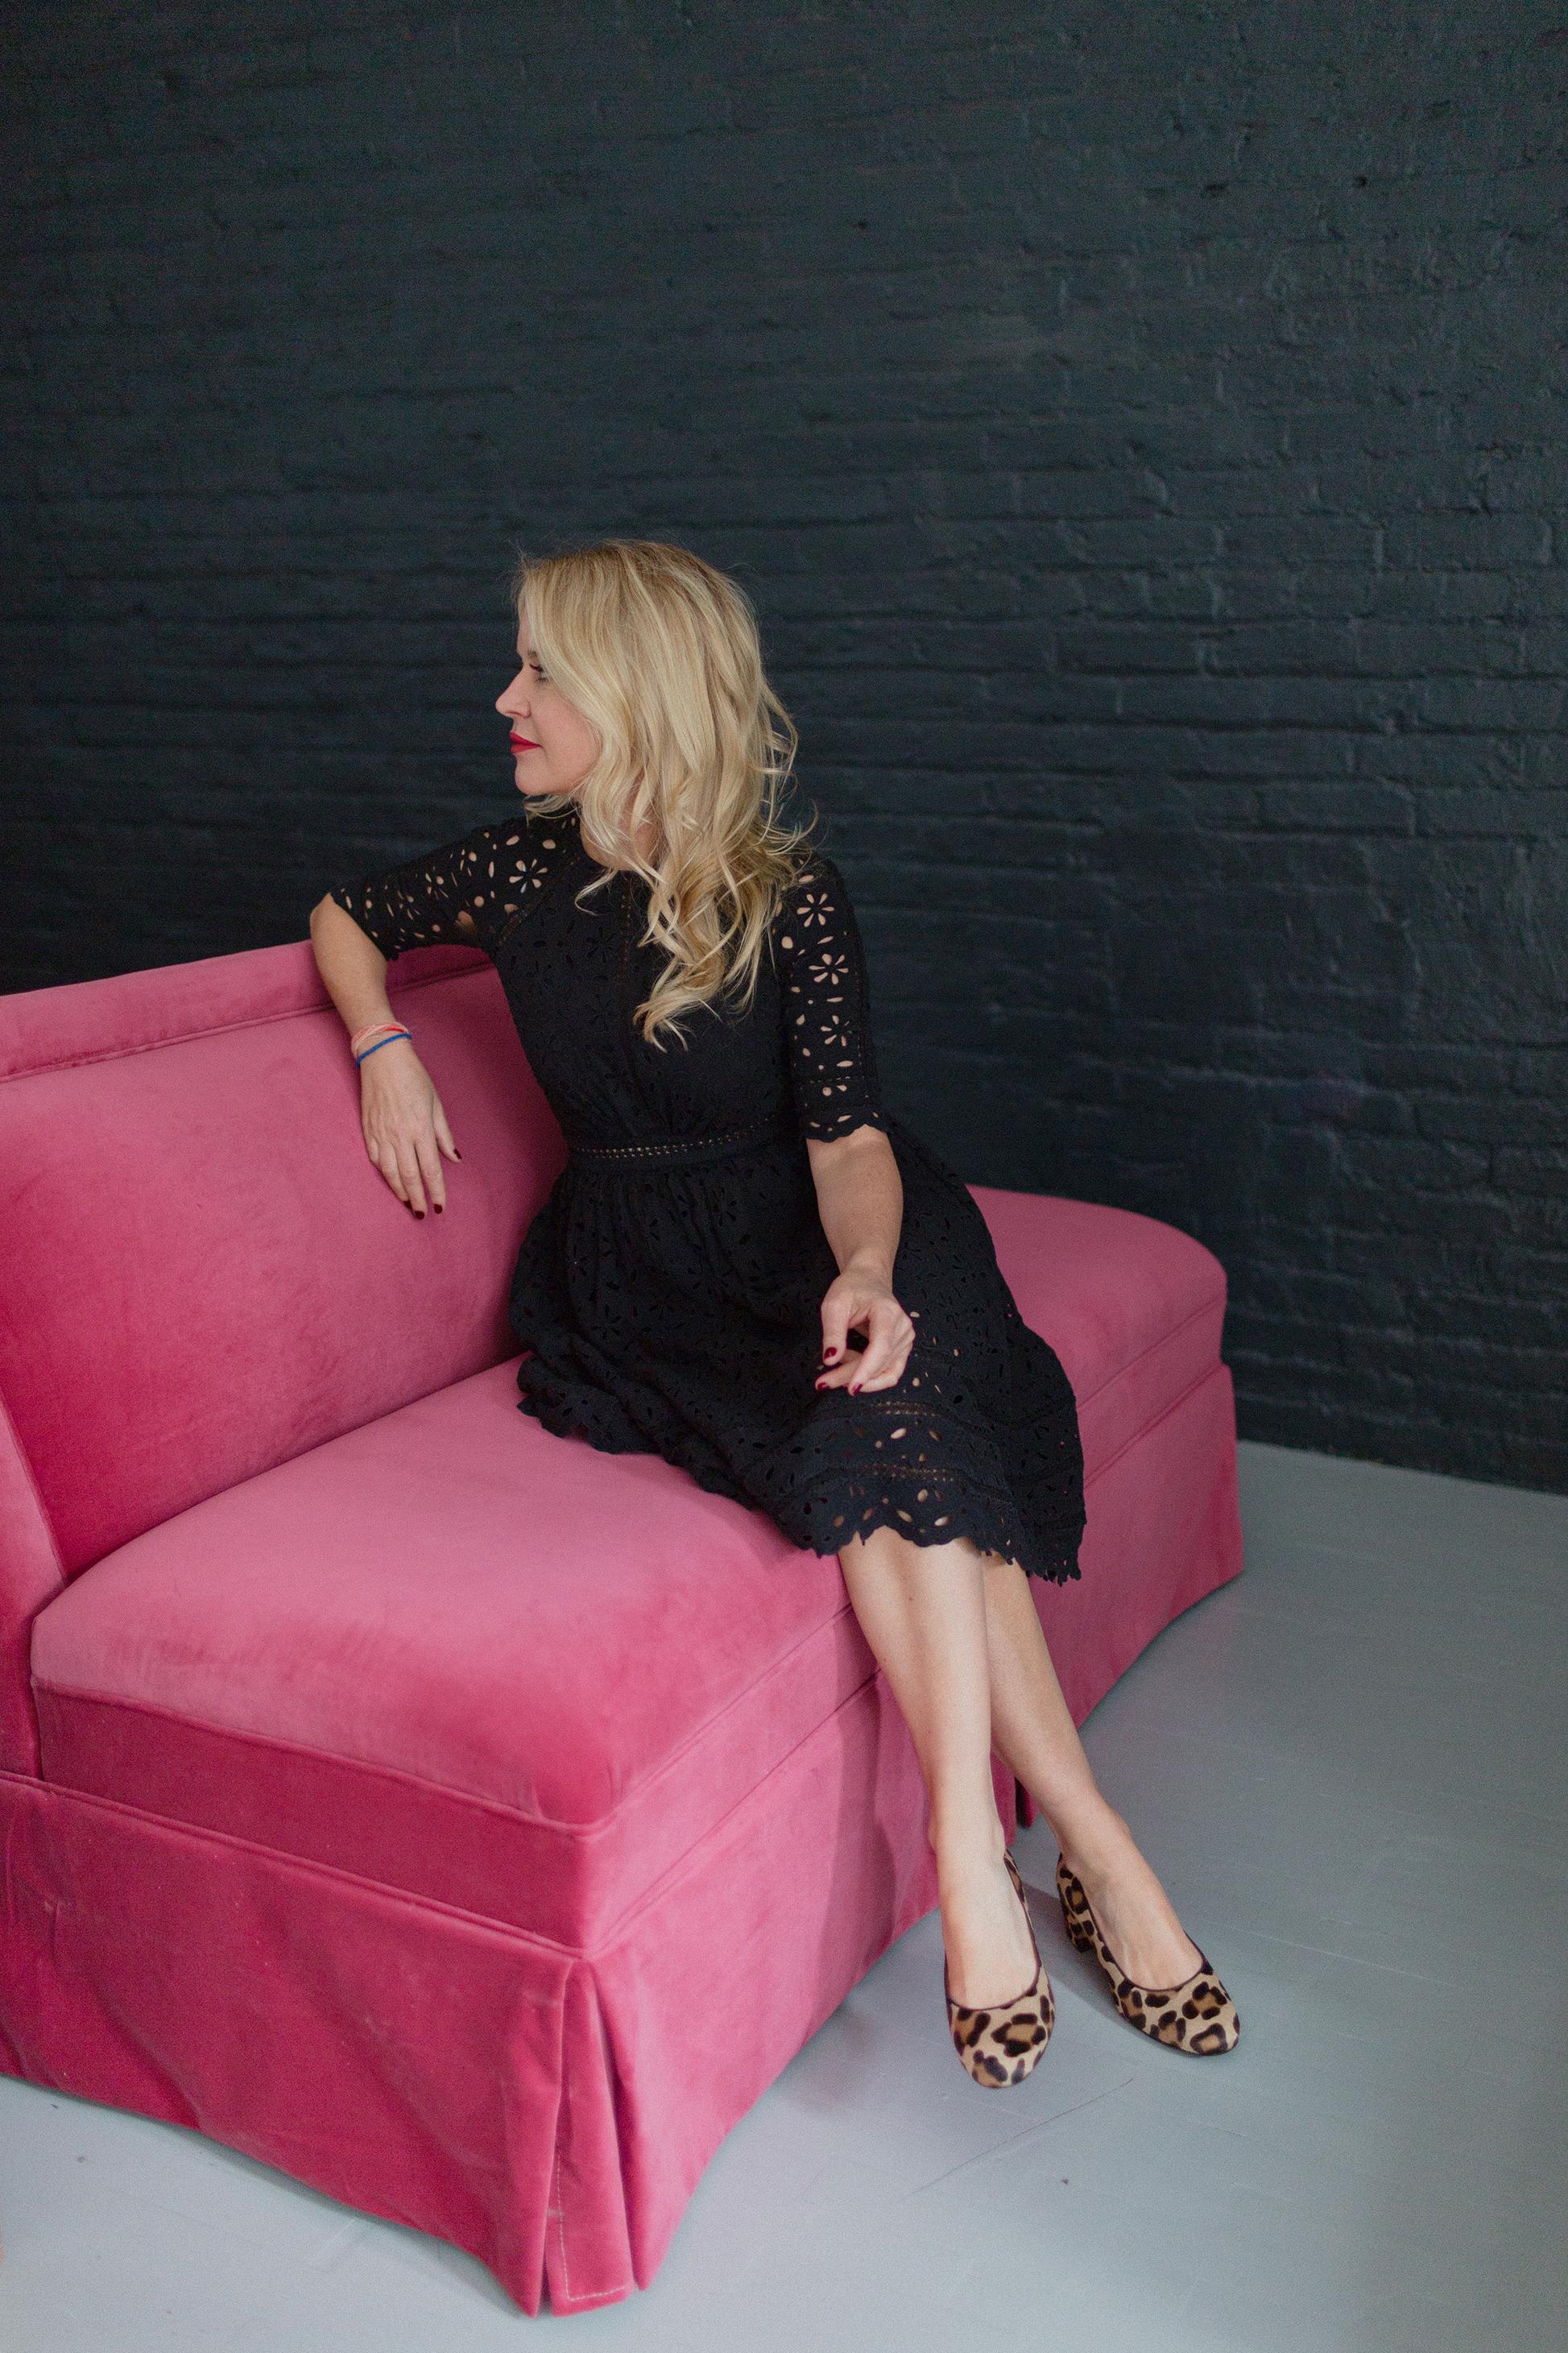 Christiane Lemieux, founder of The Inside